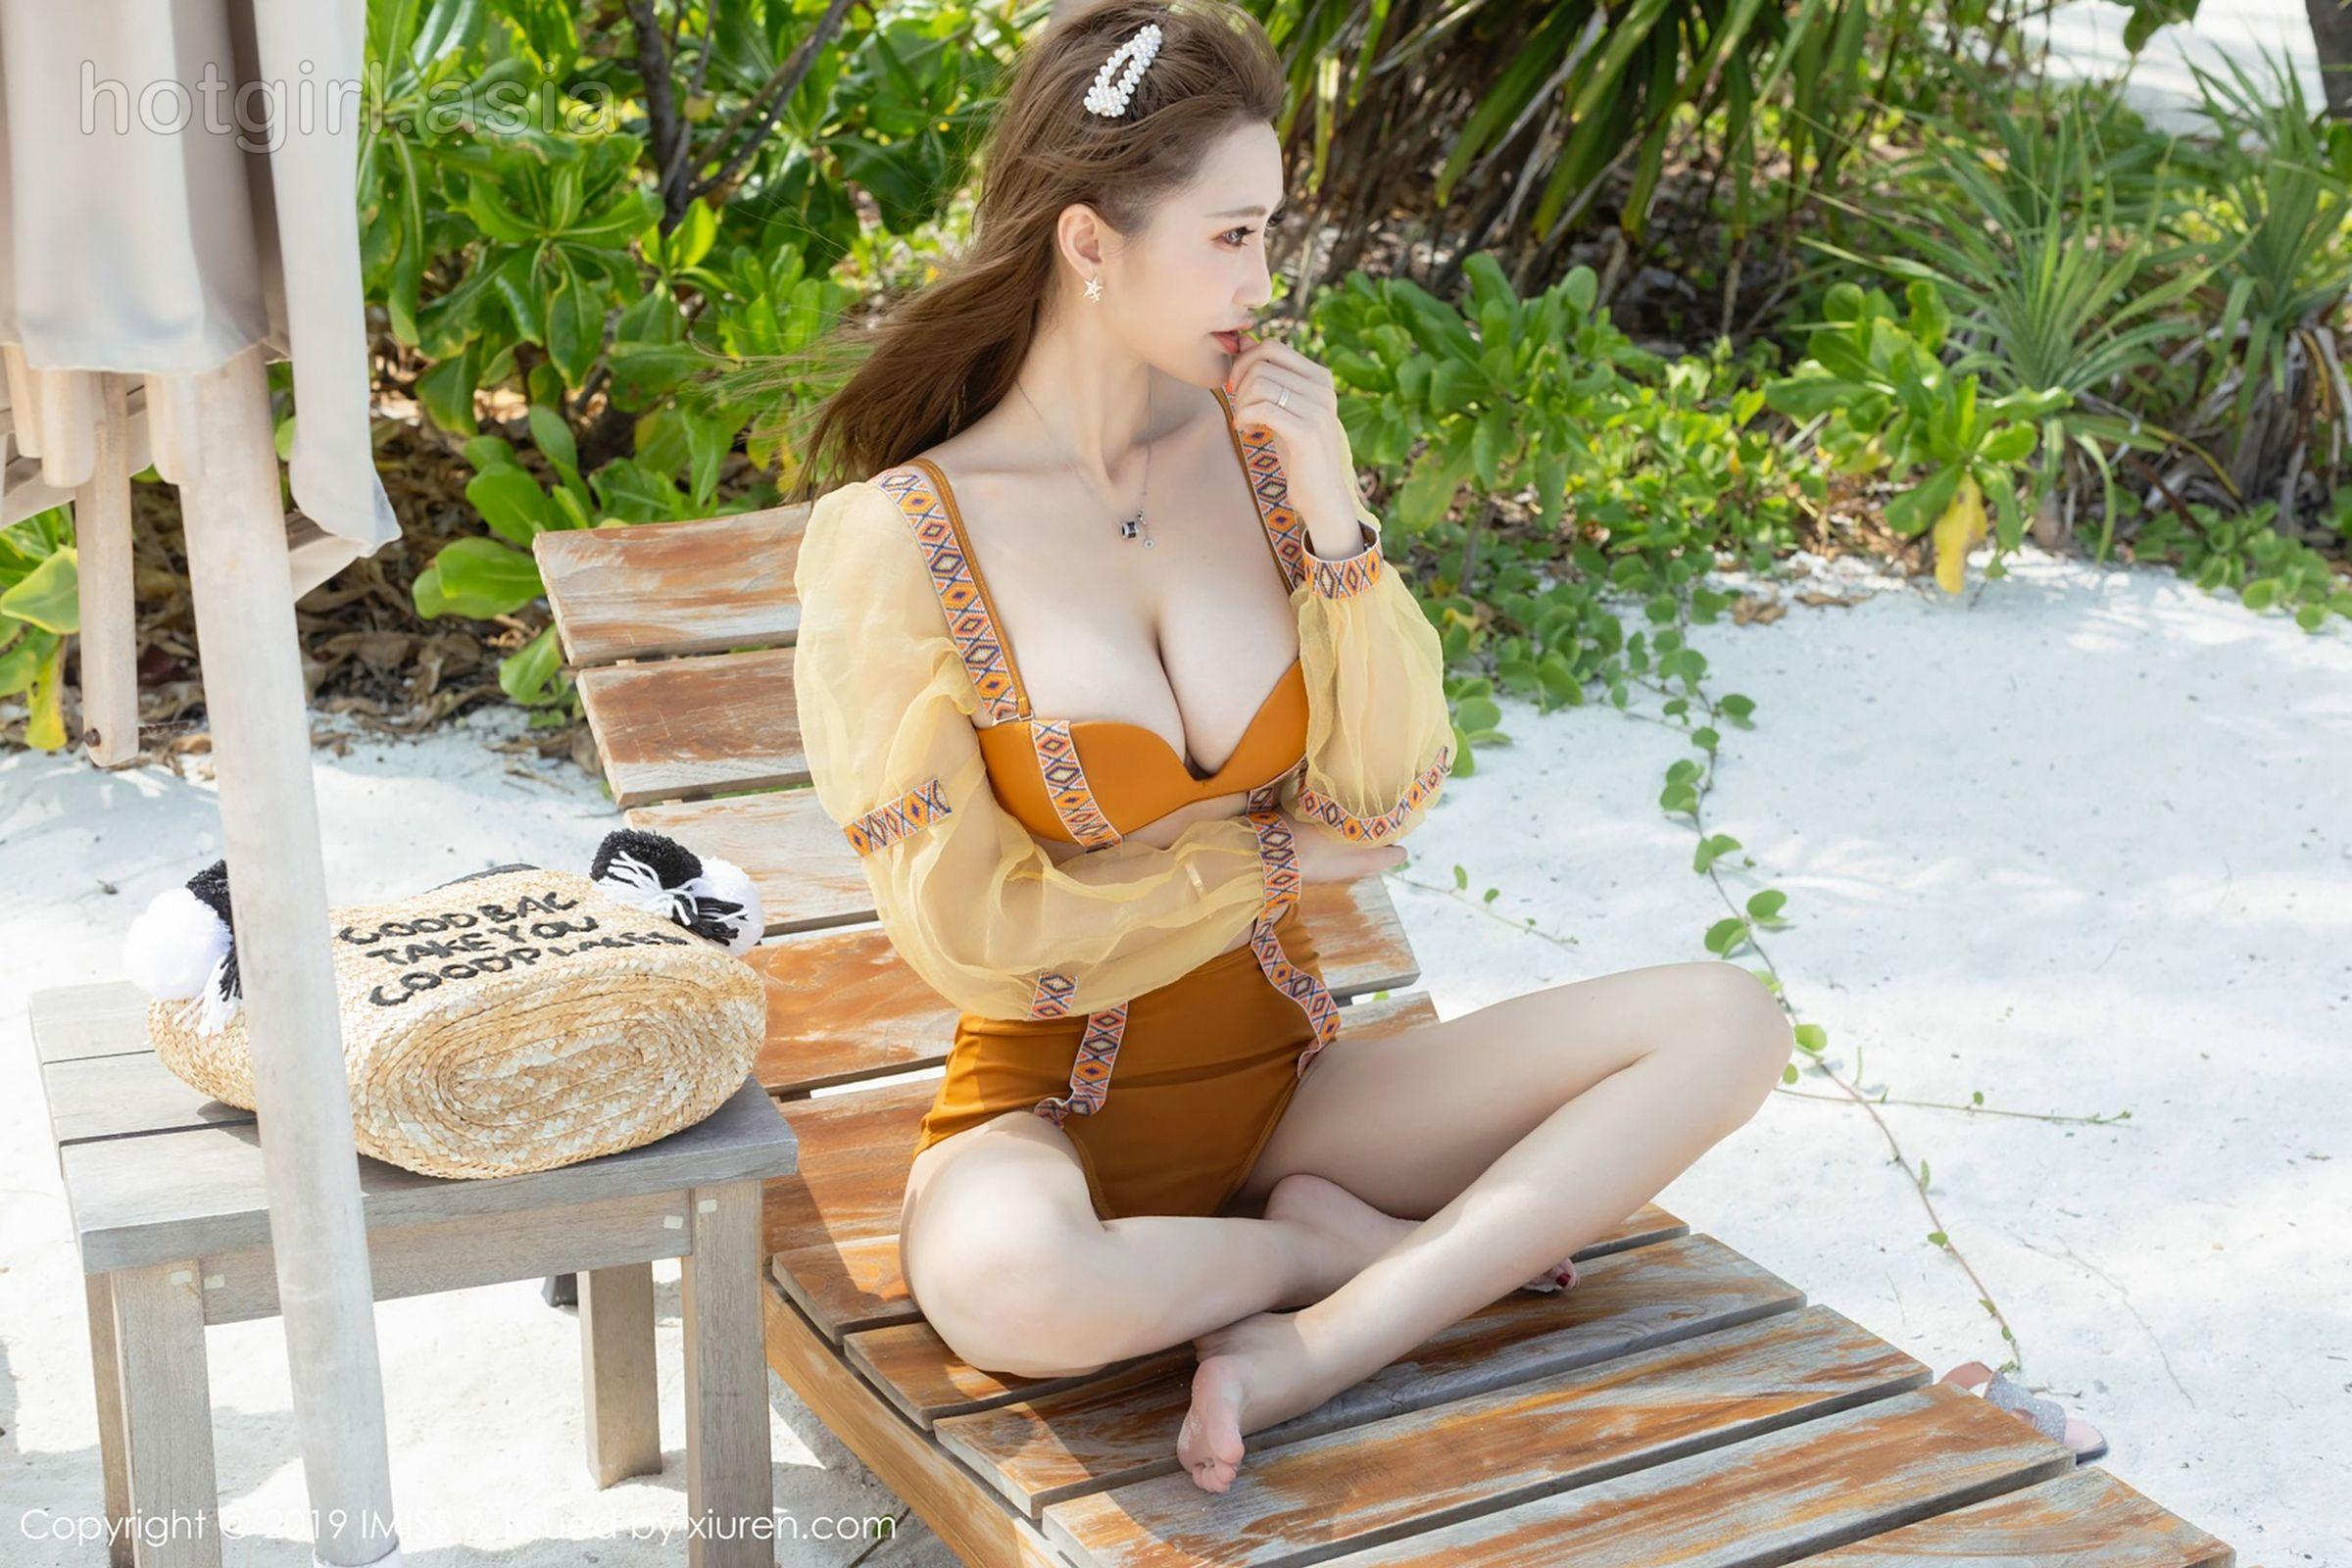 [IMiss love honey club] Vol.326 temperament goddess @妤薇Vivian Maldives travel photo